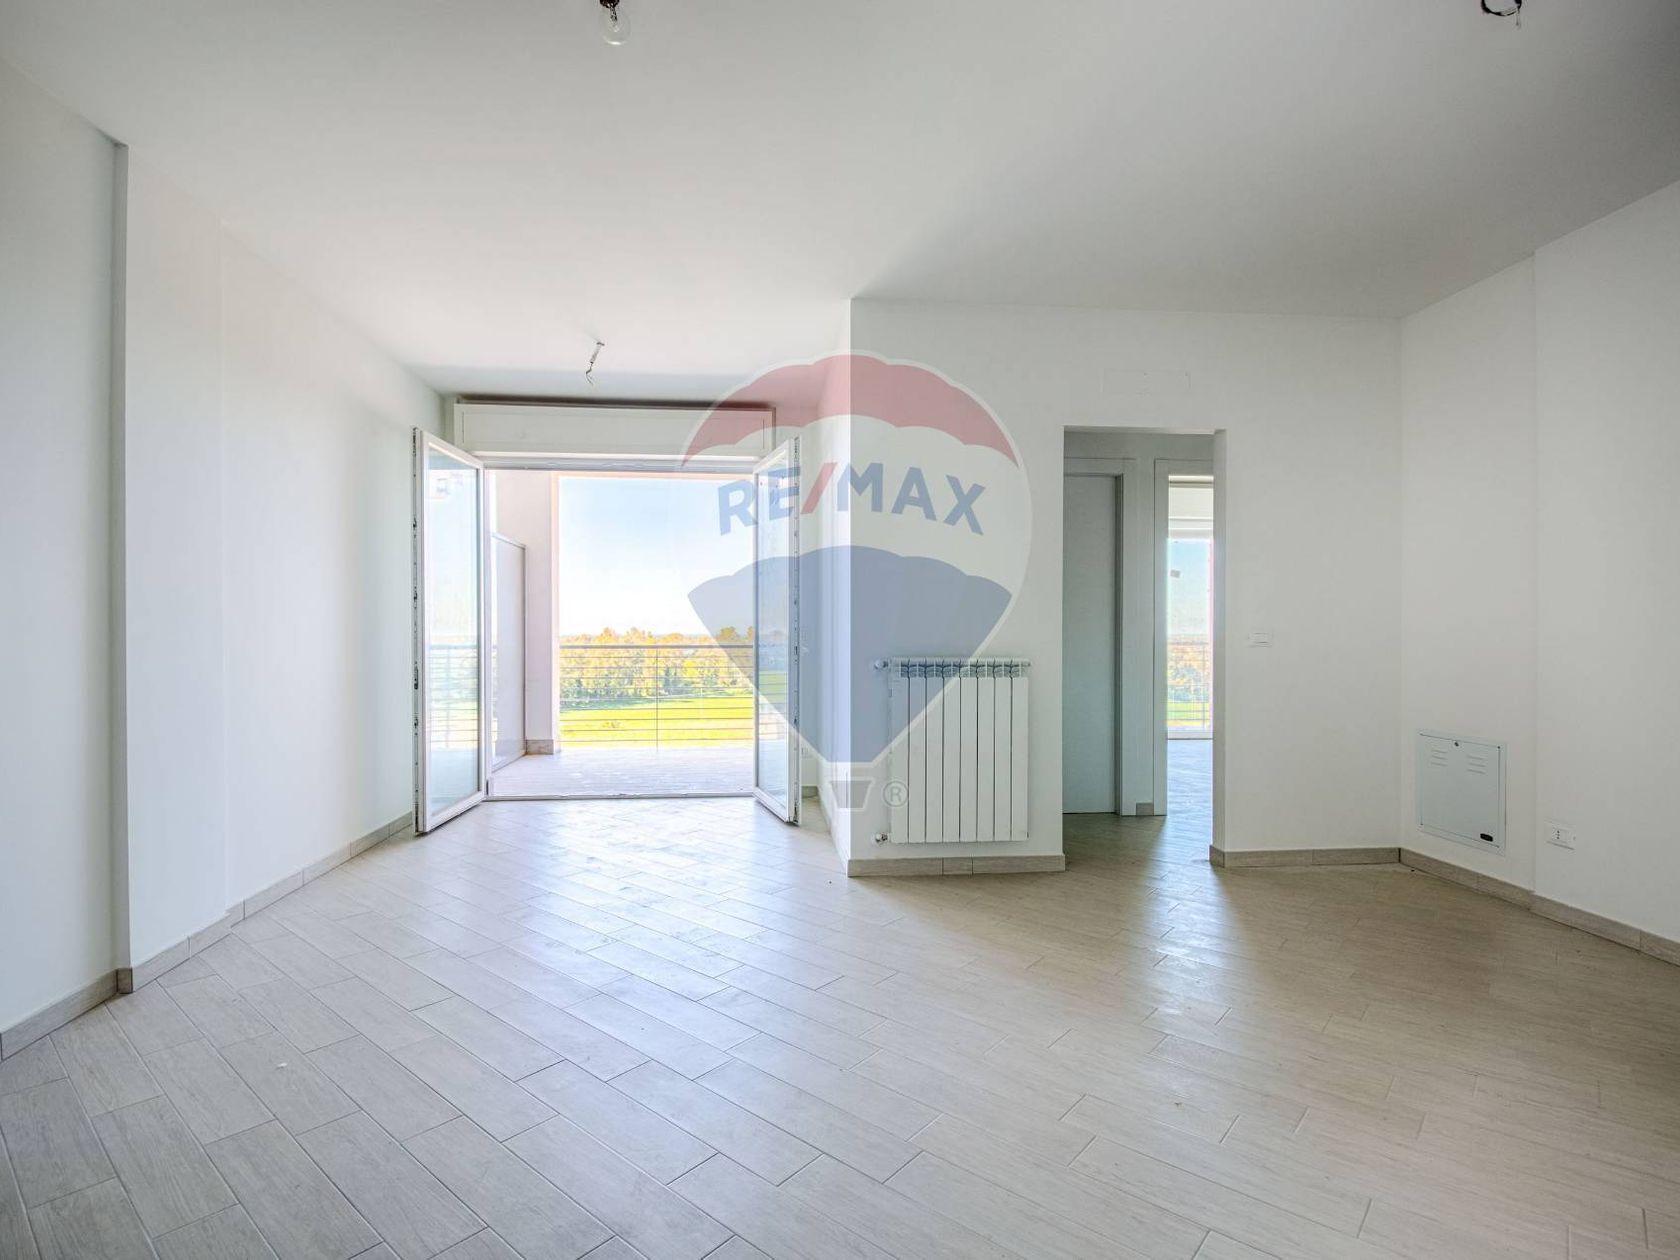 Appartamento Ara Nova, Fiumicino, RM Vendita - Foto 4